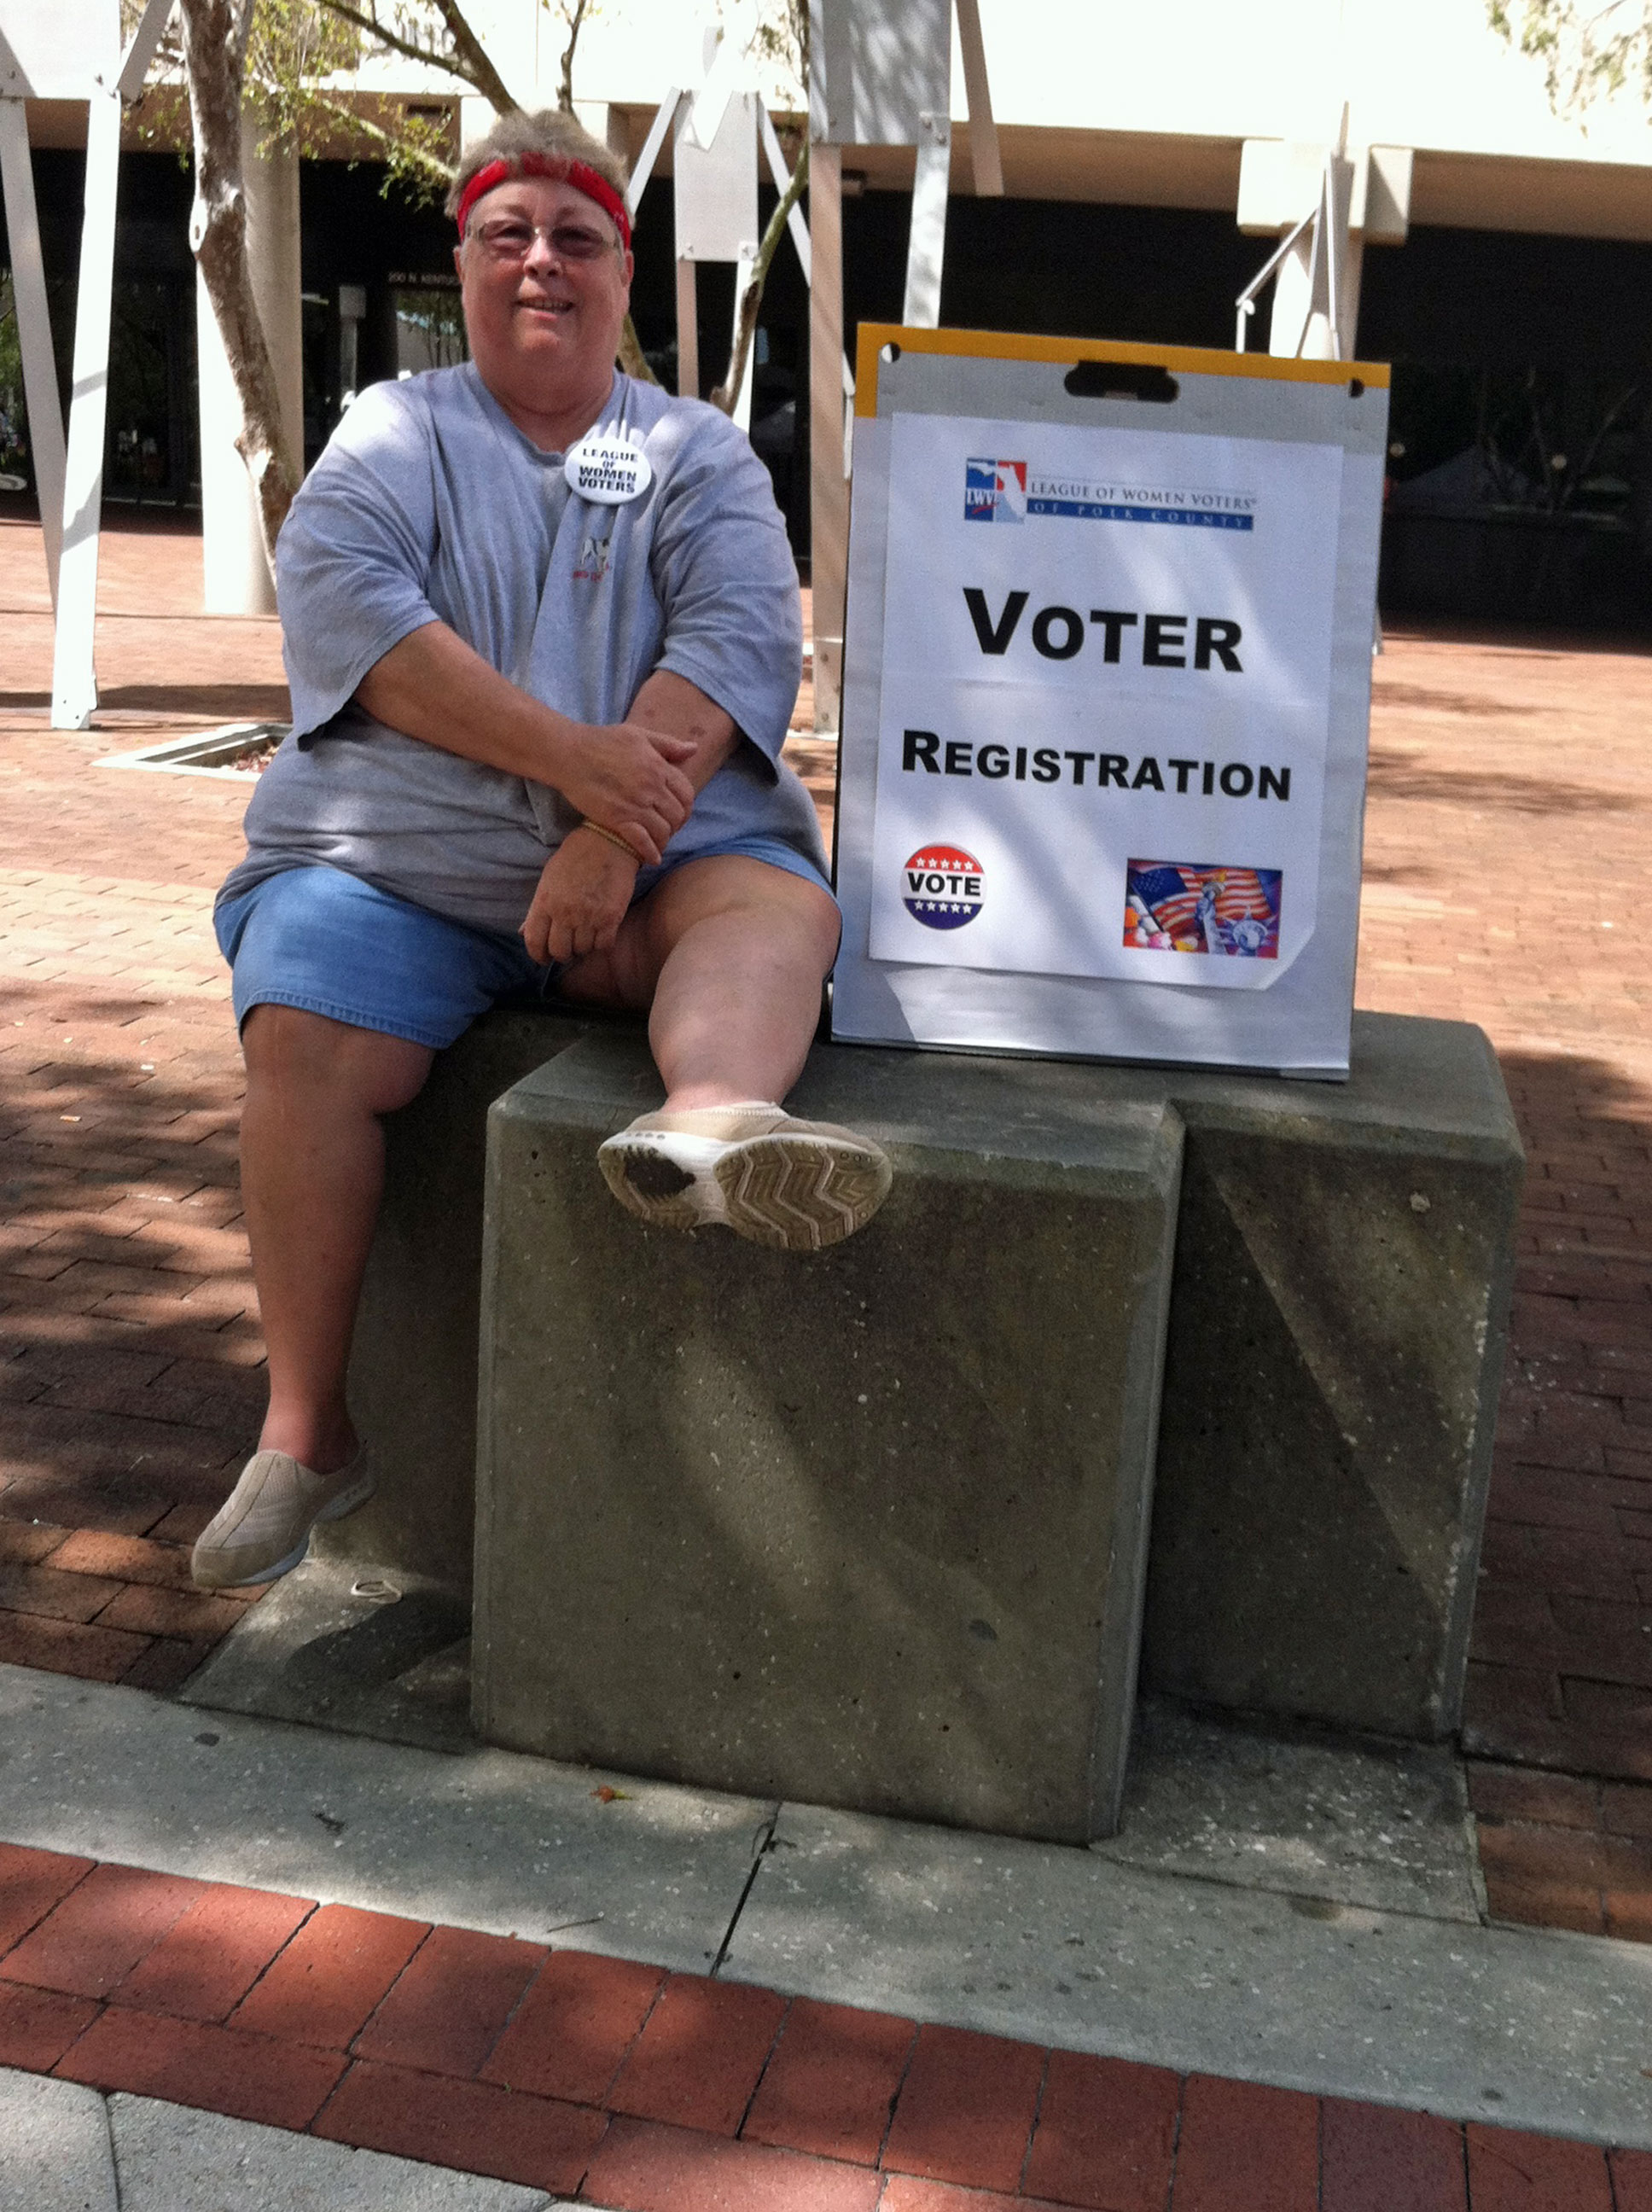 Ann and Voter Registration sign